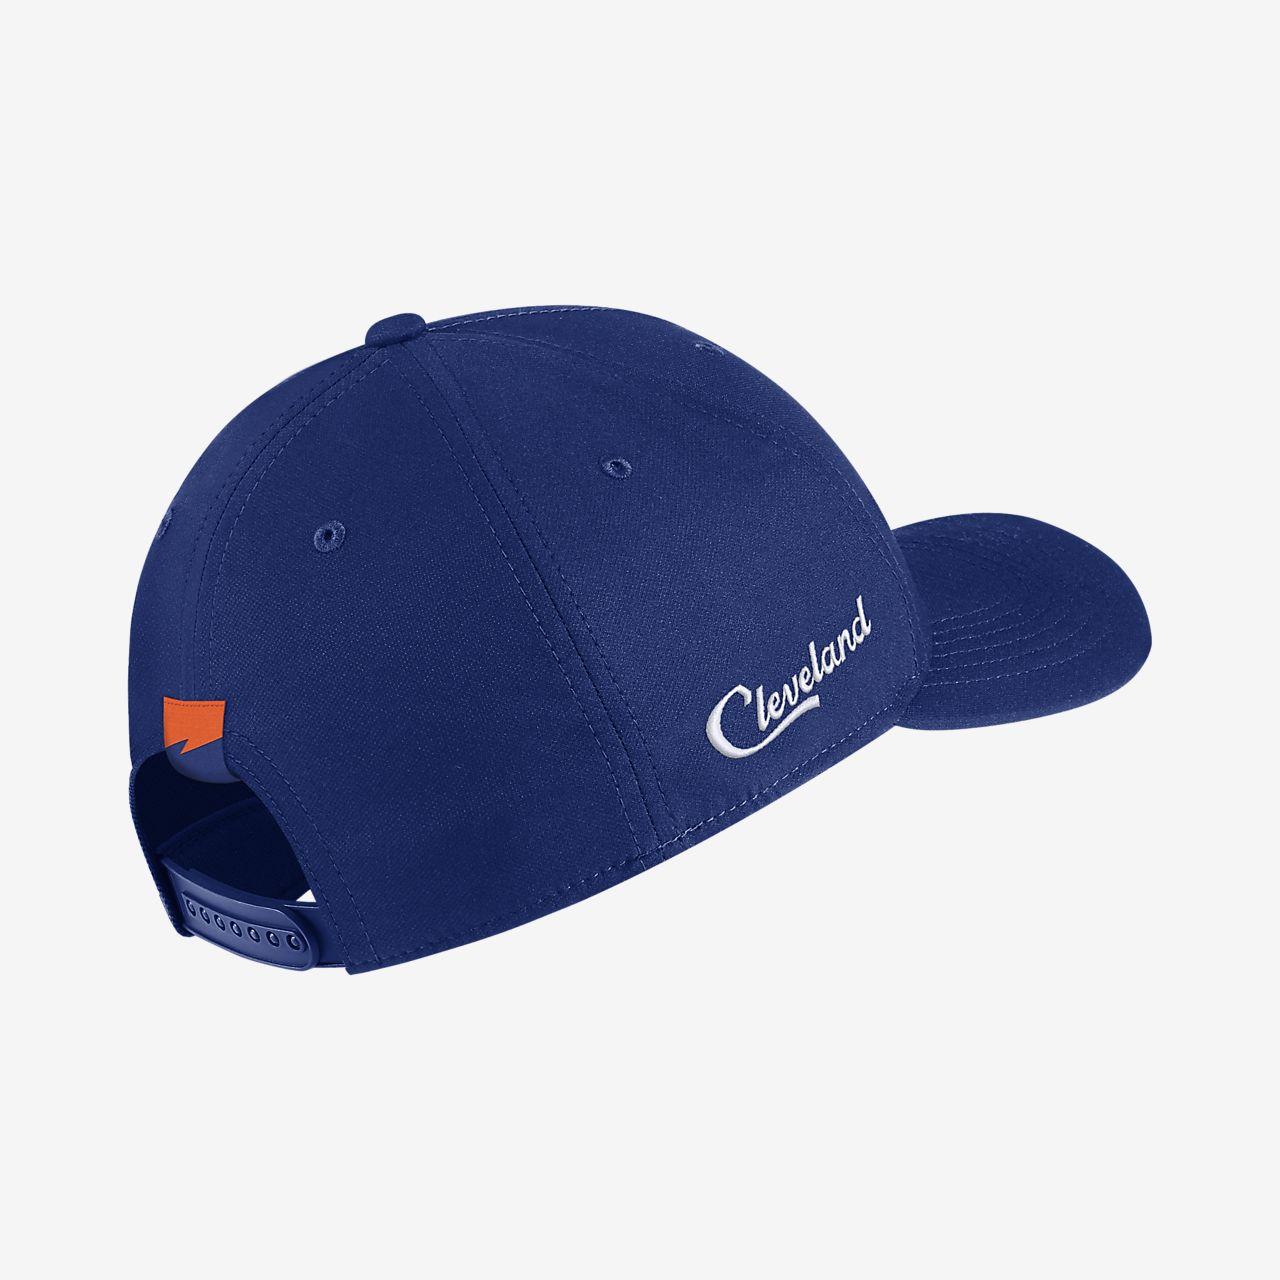 0e279ed269128 Cleveland Cavaliers City Edition Nike AeroBill Classic99 NBA Hat ...